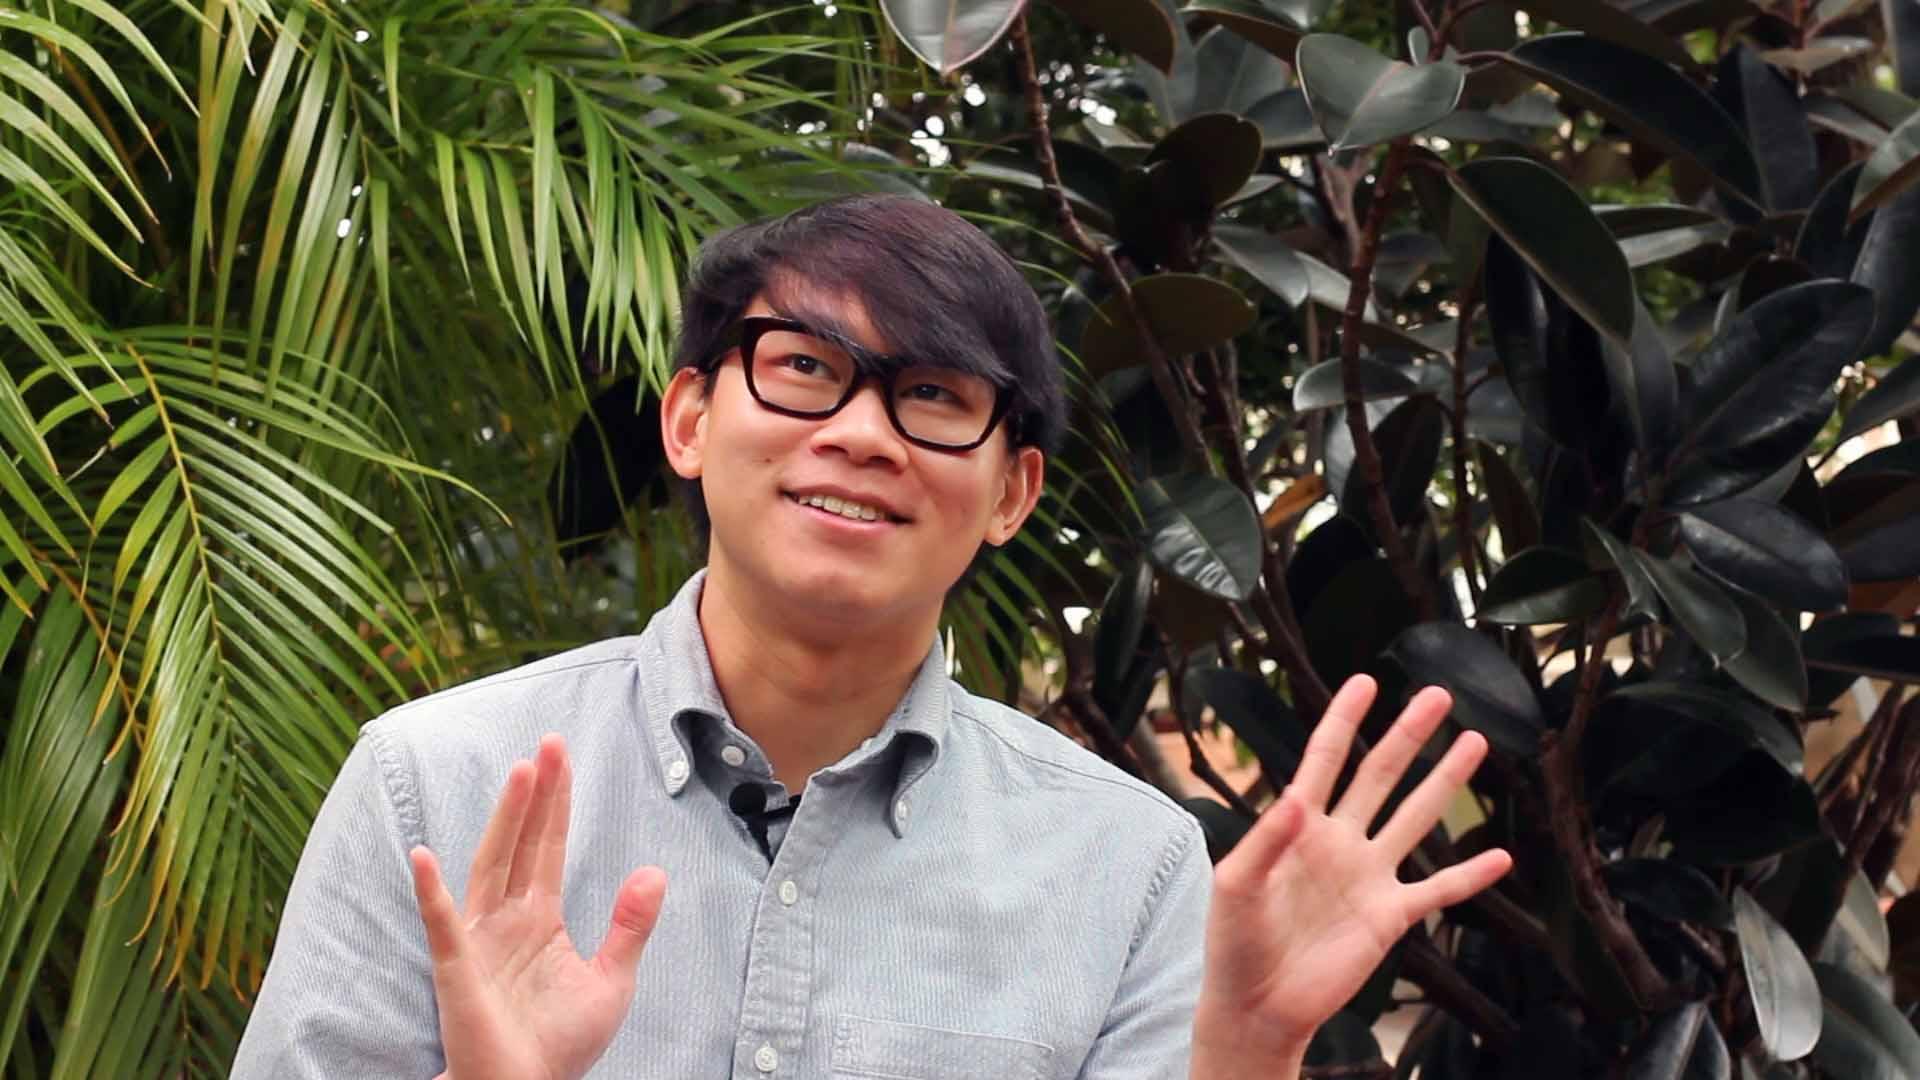 Composer Viet Cuong